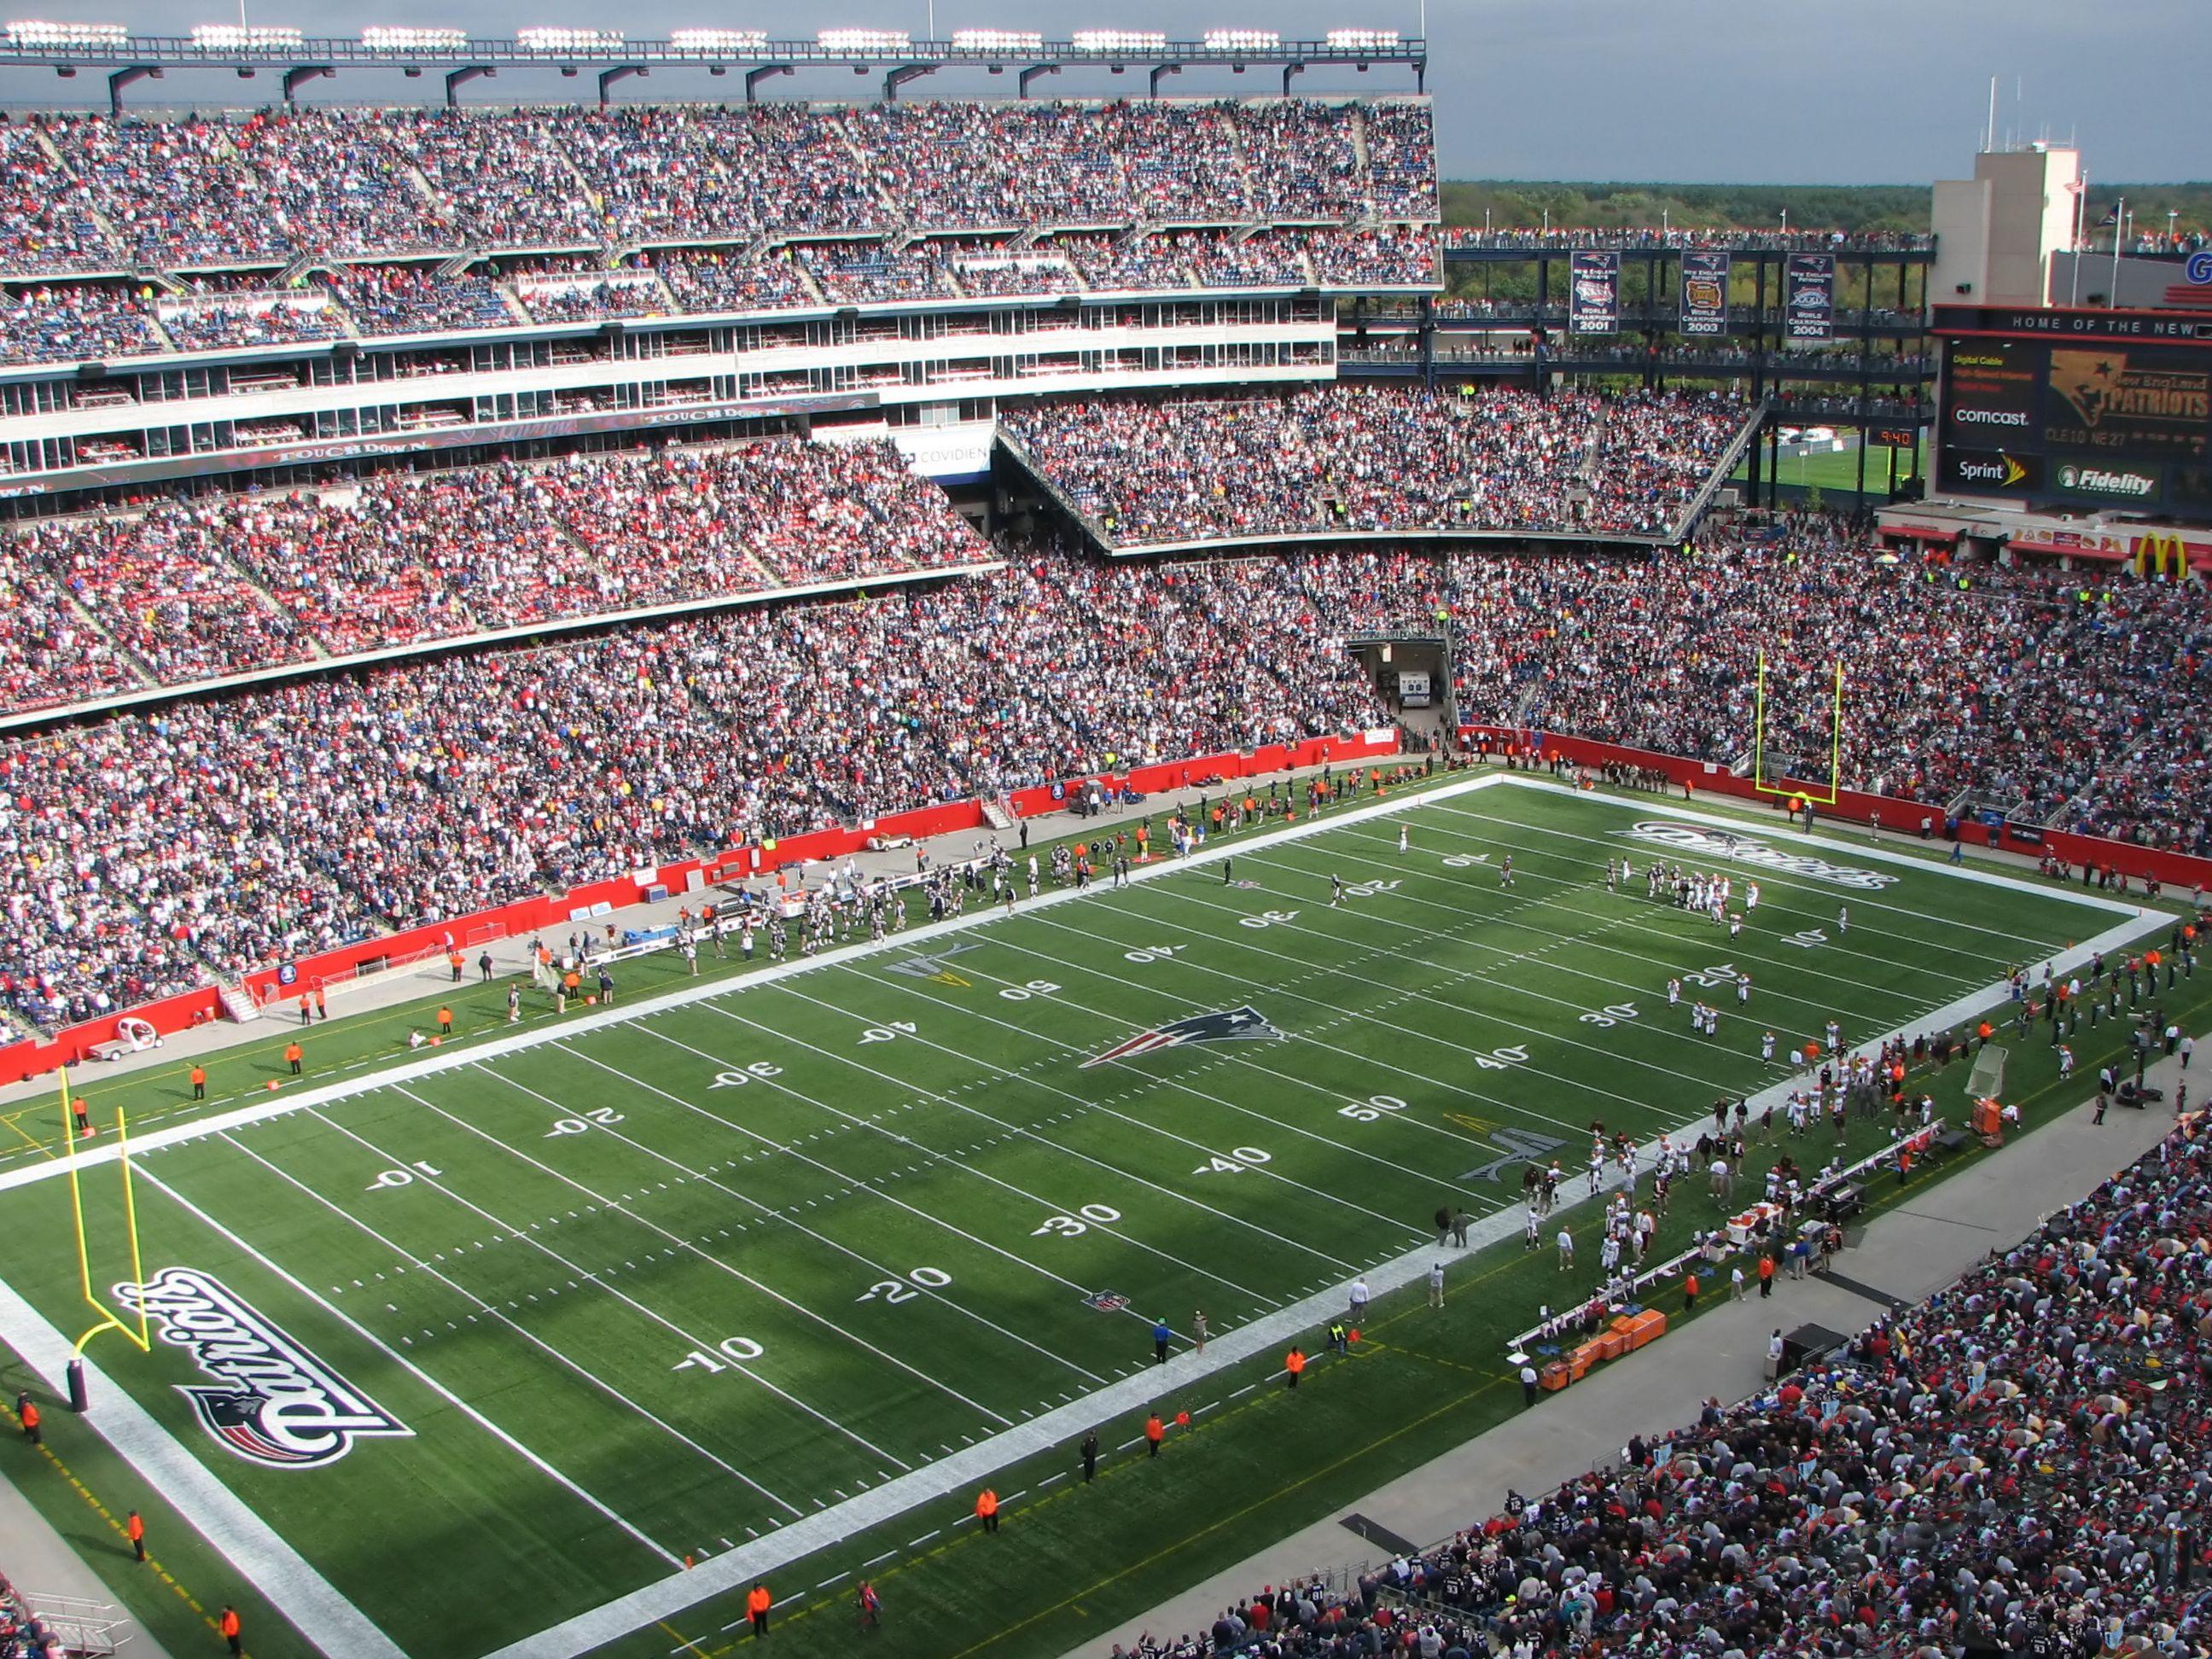 Gillette Stadium File Gillette Stadium02 Jpg Wikipedia The Free Encyclopedia Gillette Stadium New England Patriots Football Foxborough